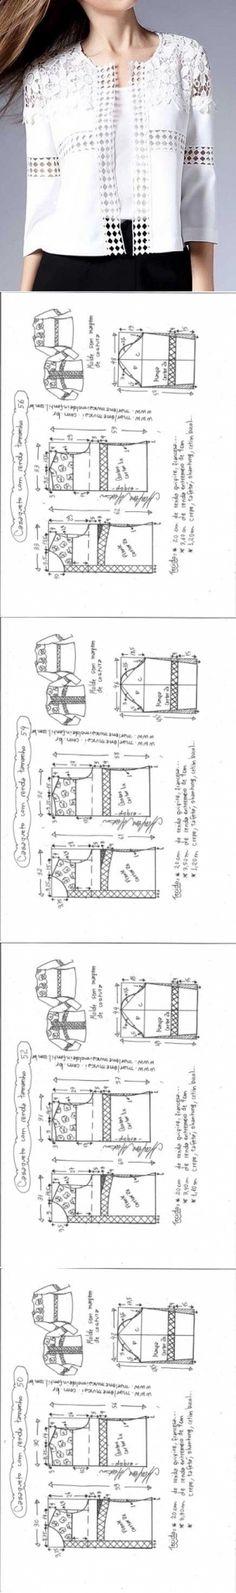 Casaqueto com entremeio   DIY - molde, corte e costura - Marlene Mukai